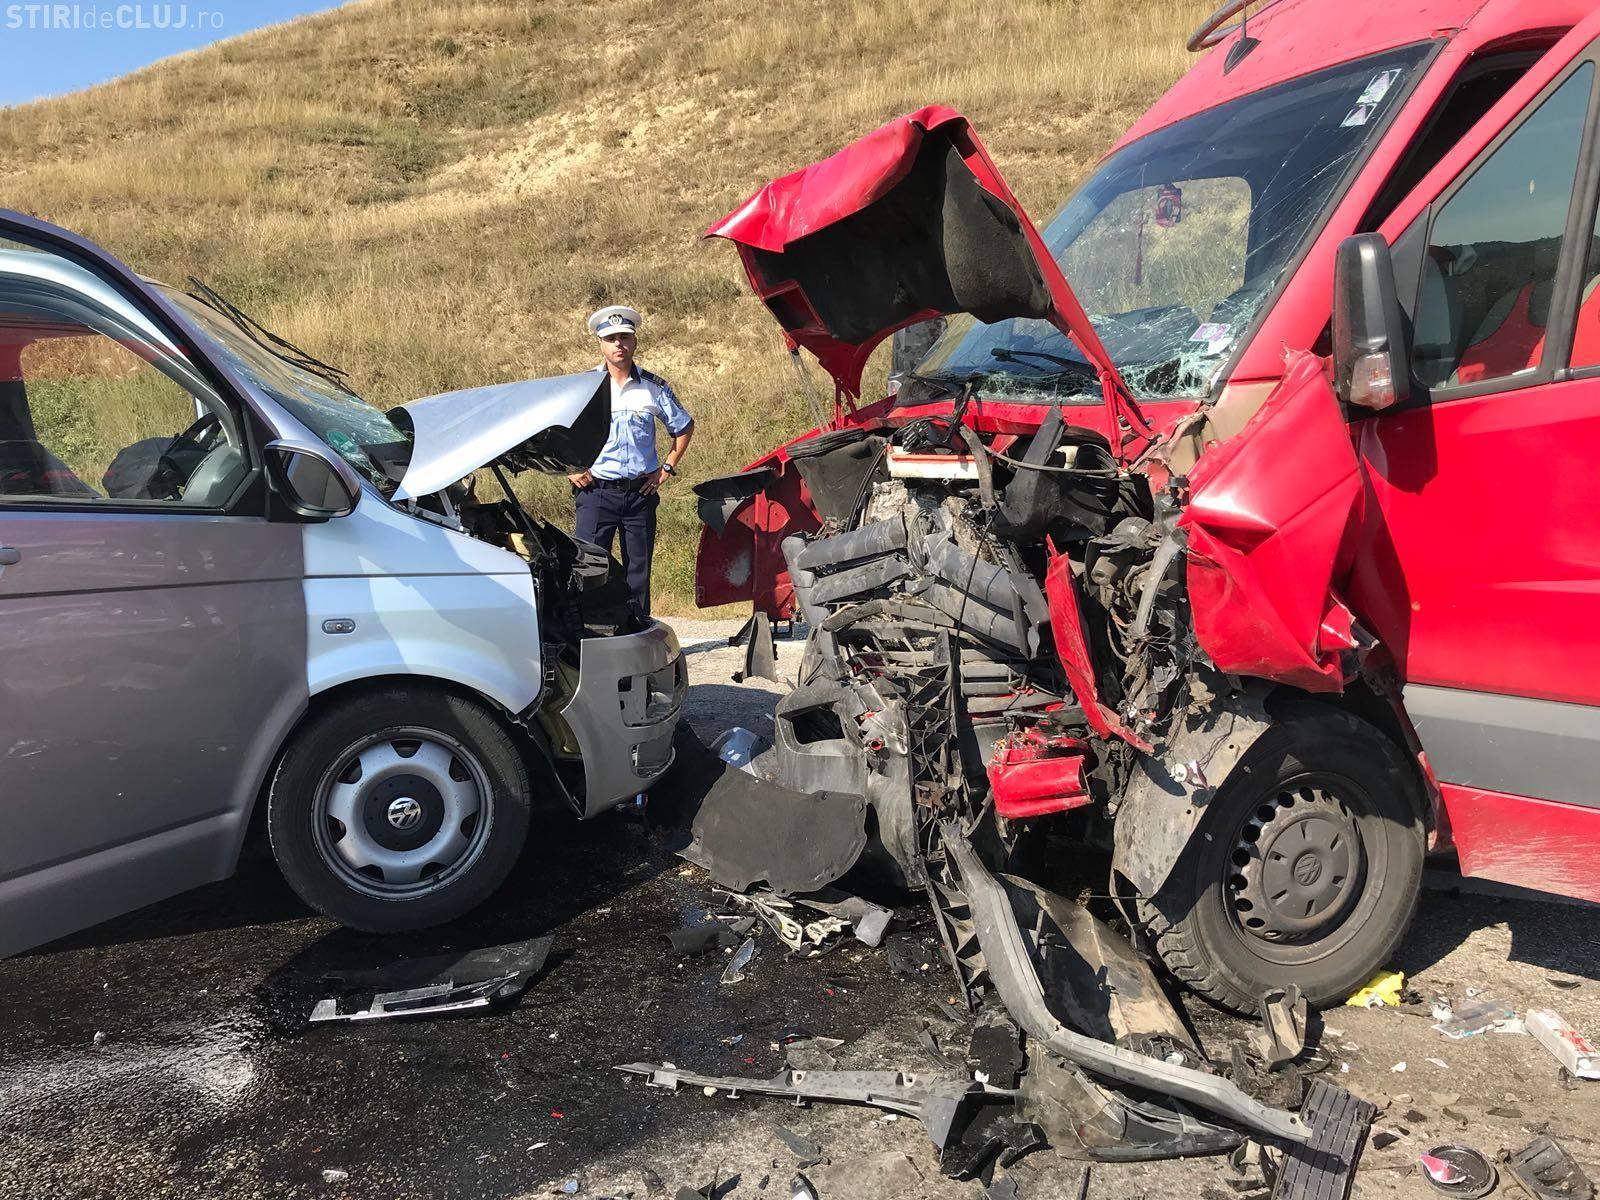 Accident grav la Cămărașu, pe drumul de la Cluj-Napoca la Reghin. A fost chemat elicopterul SMURD - FOTO